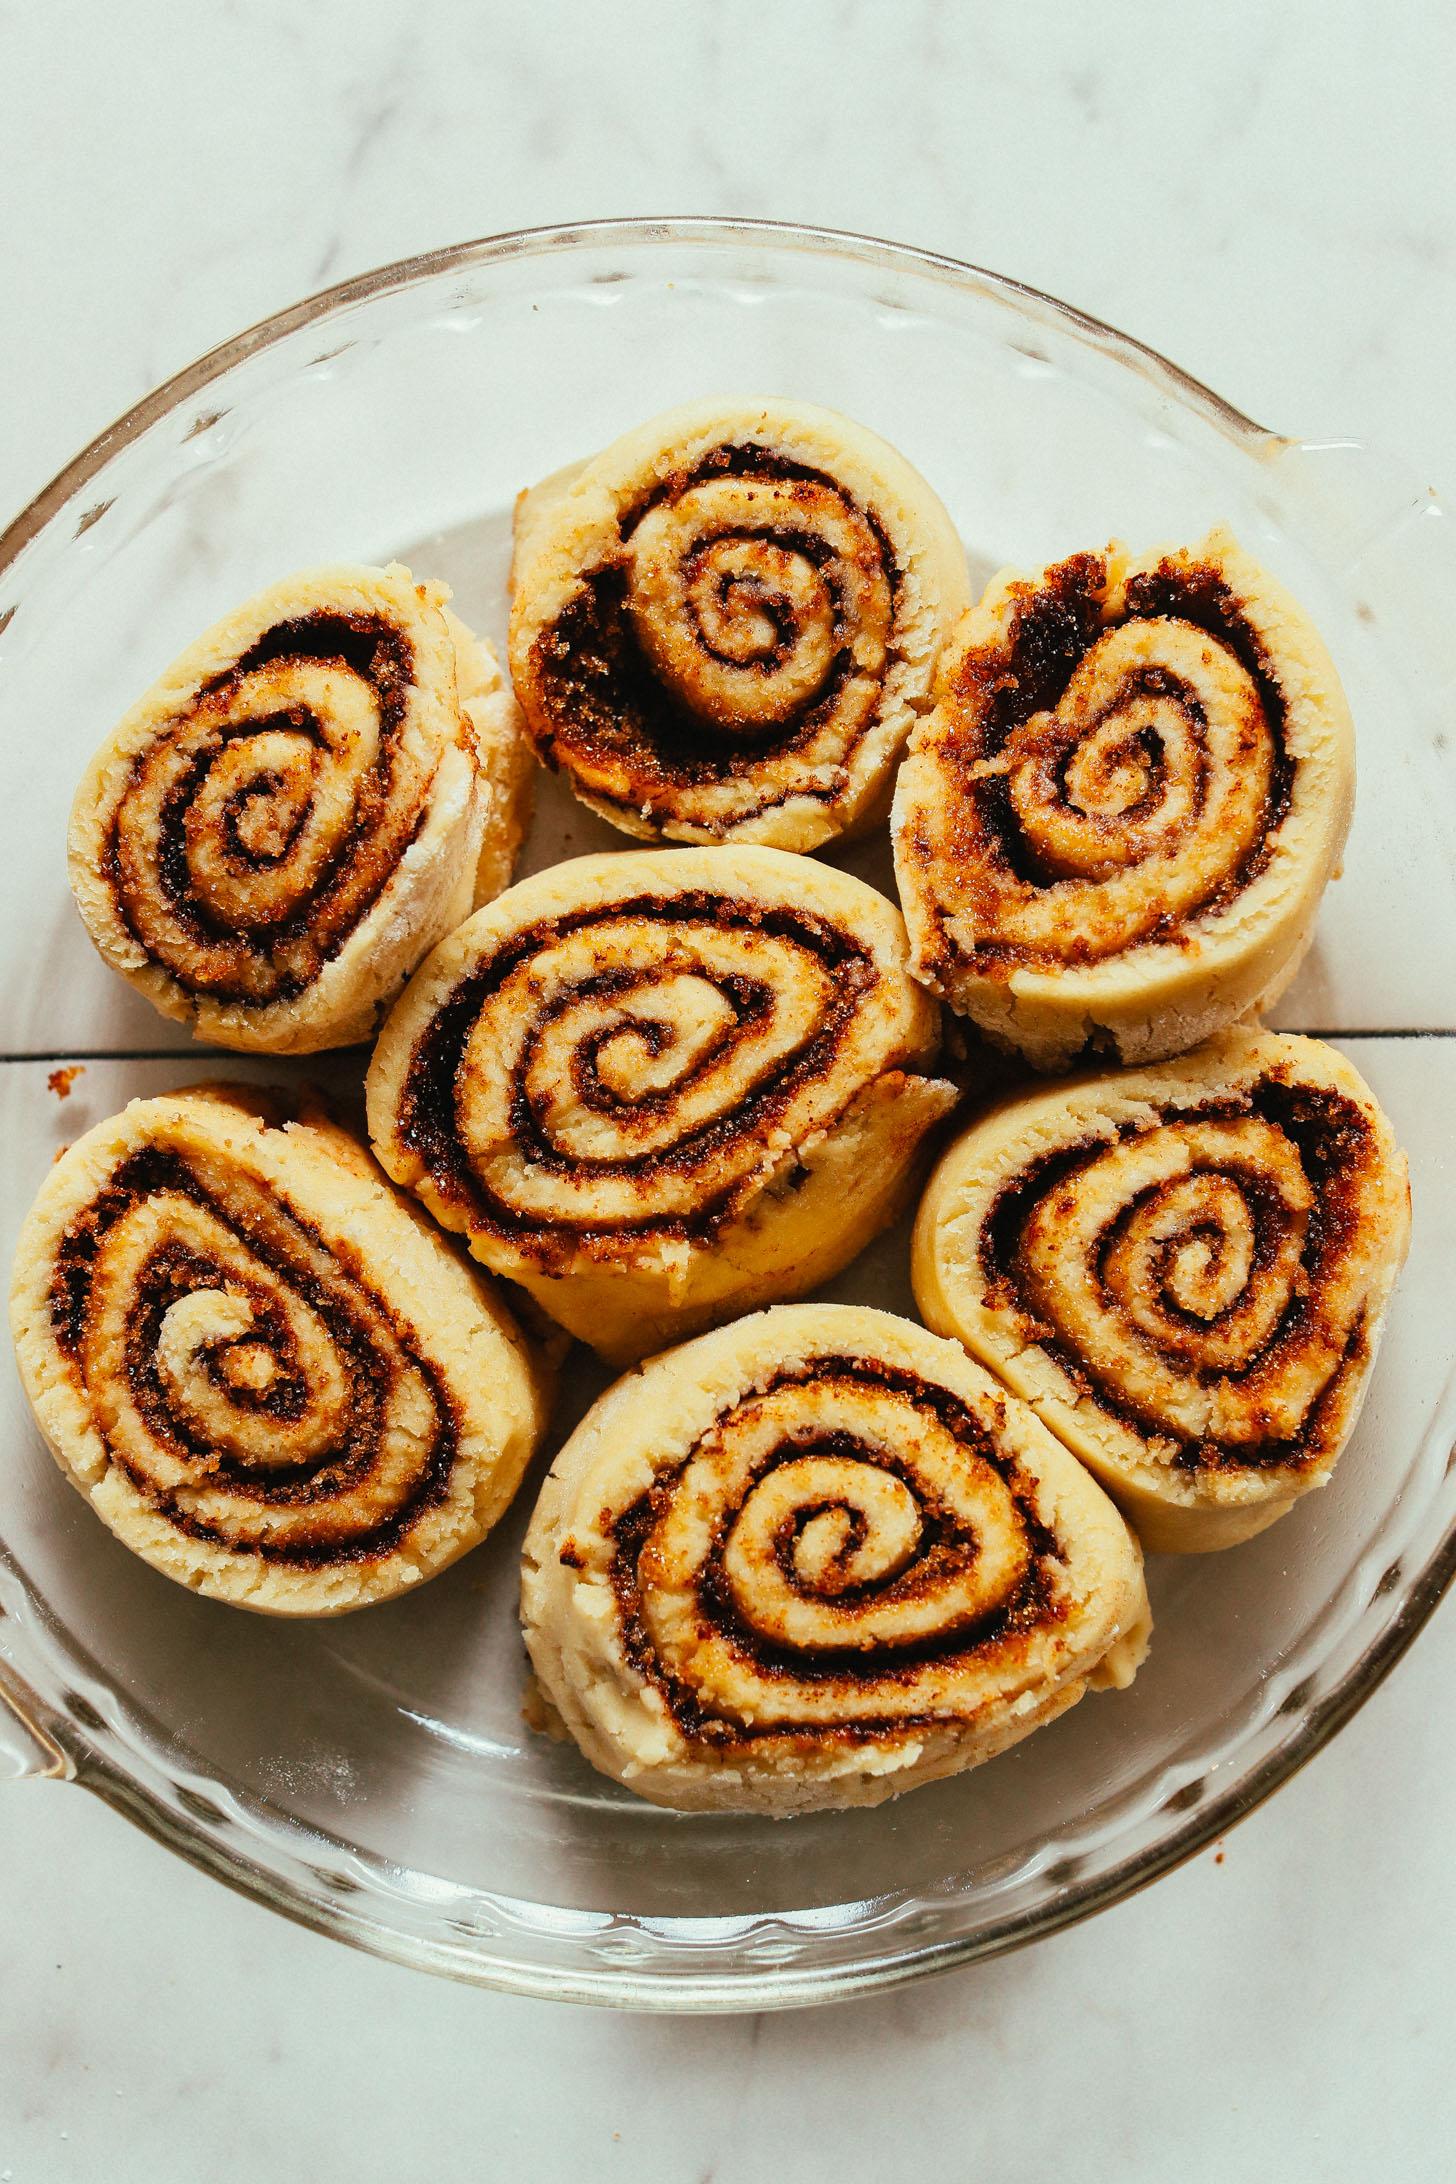 Pan of freshly risen Vegan Gluten Free Cinnamon Rolls ready to go in the oven